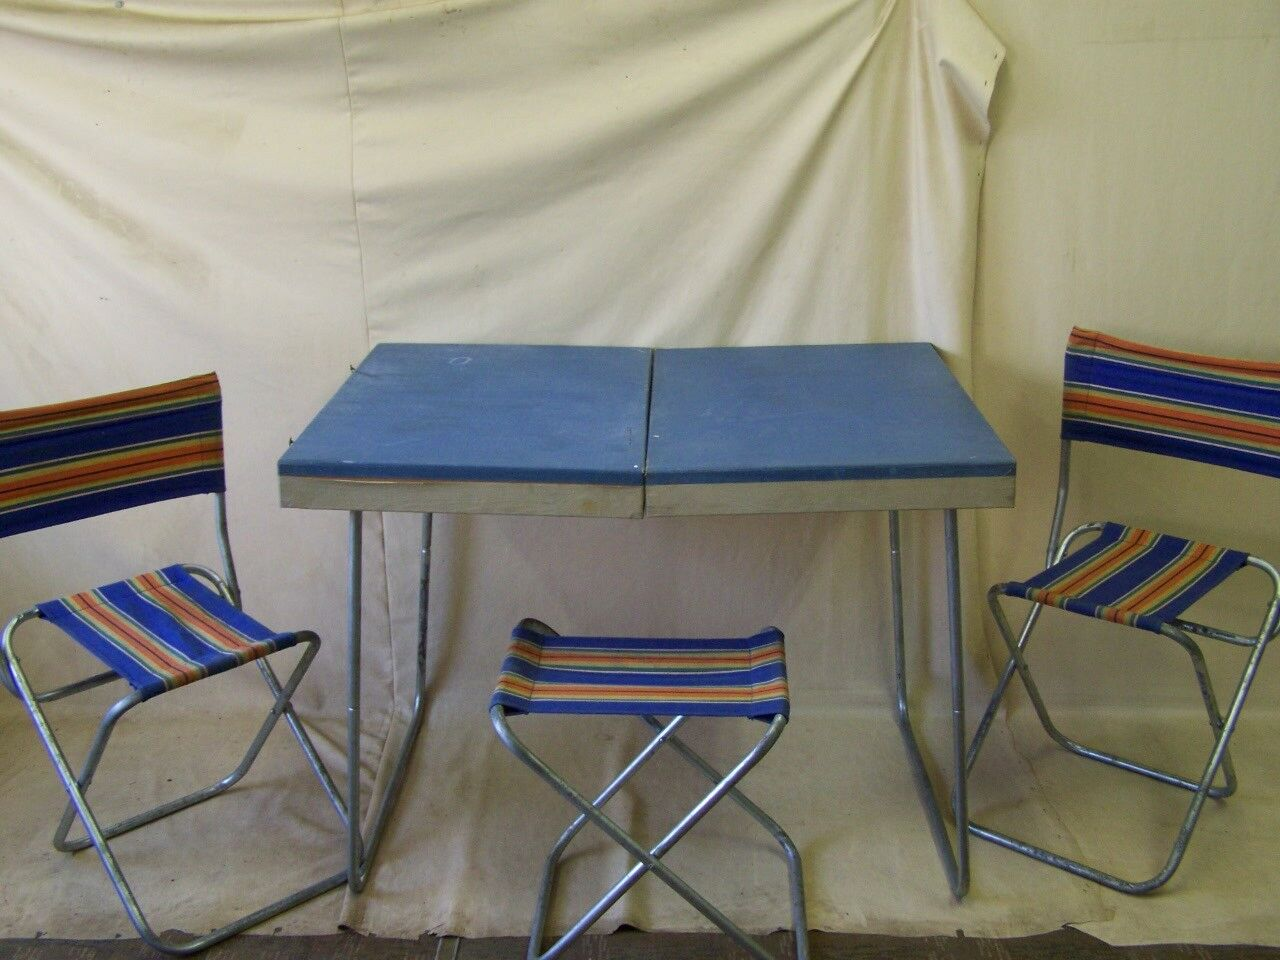 Antigua Rda Mesa Plegable, de Camping, Culto Diseño Retro 70s Año Maletín